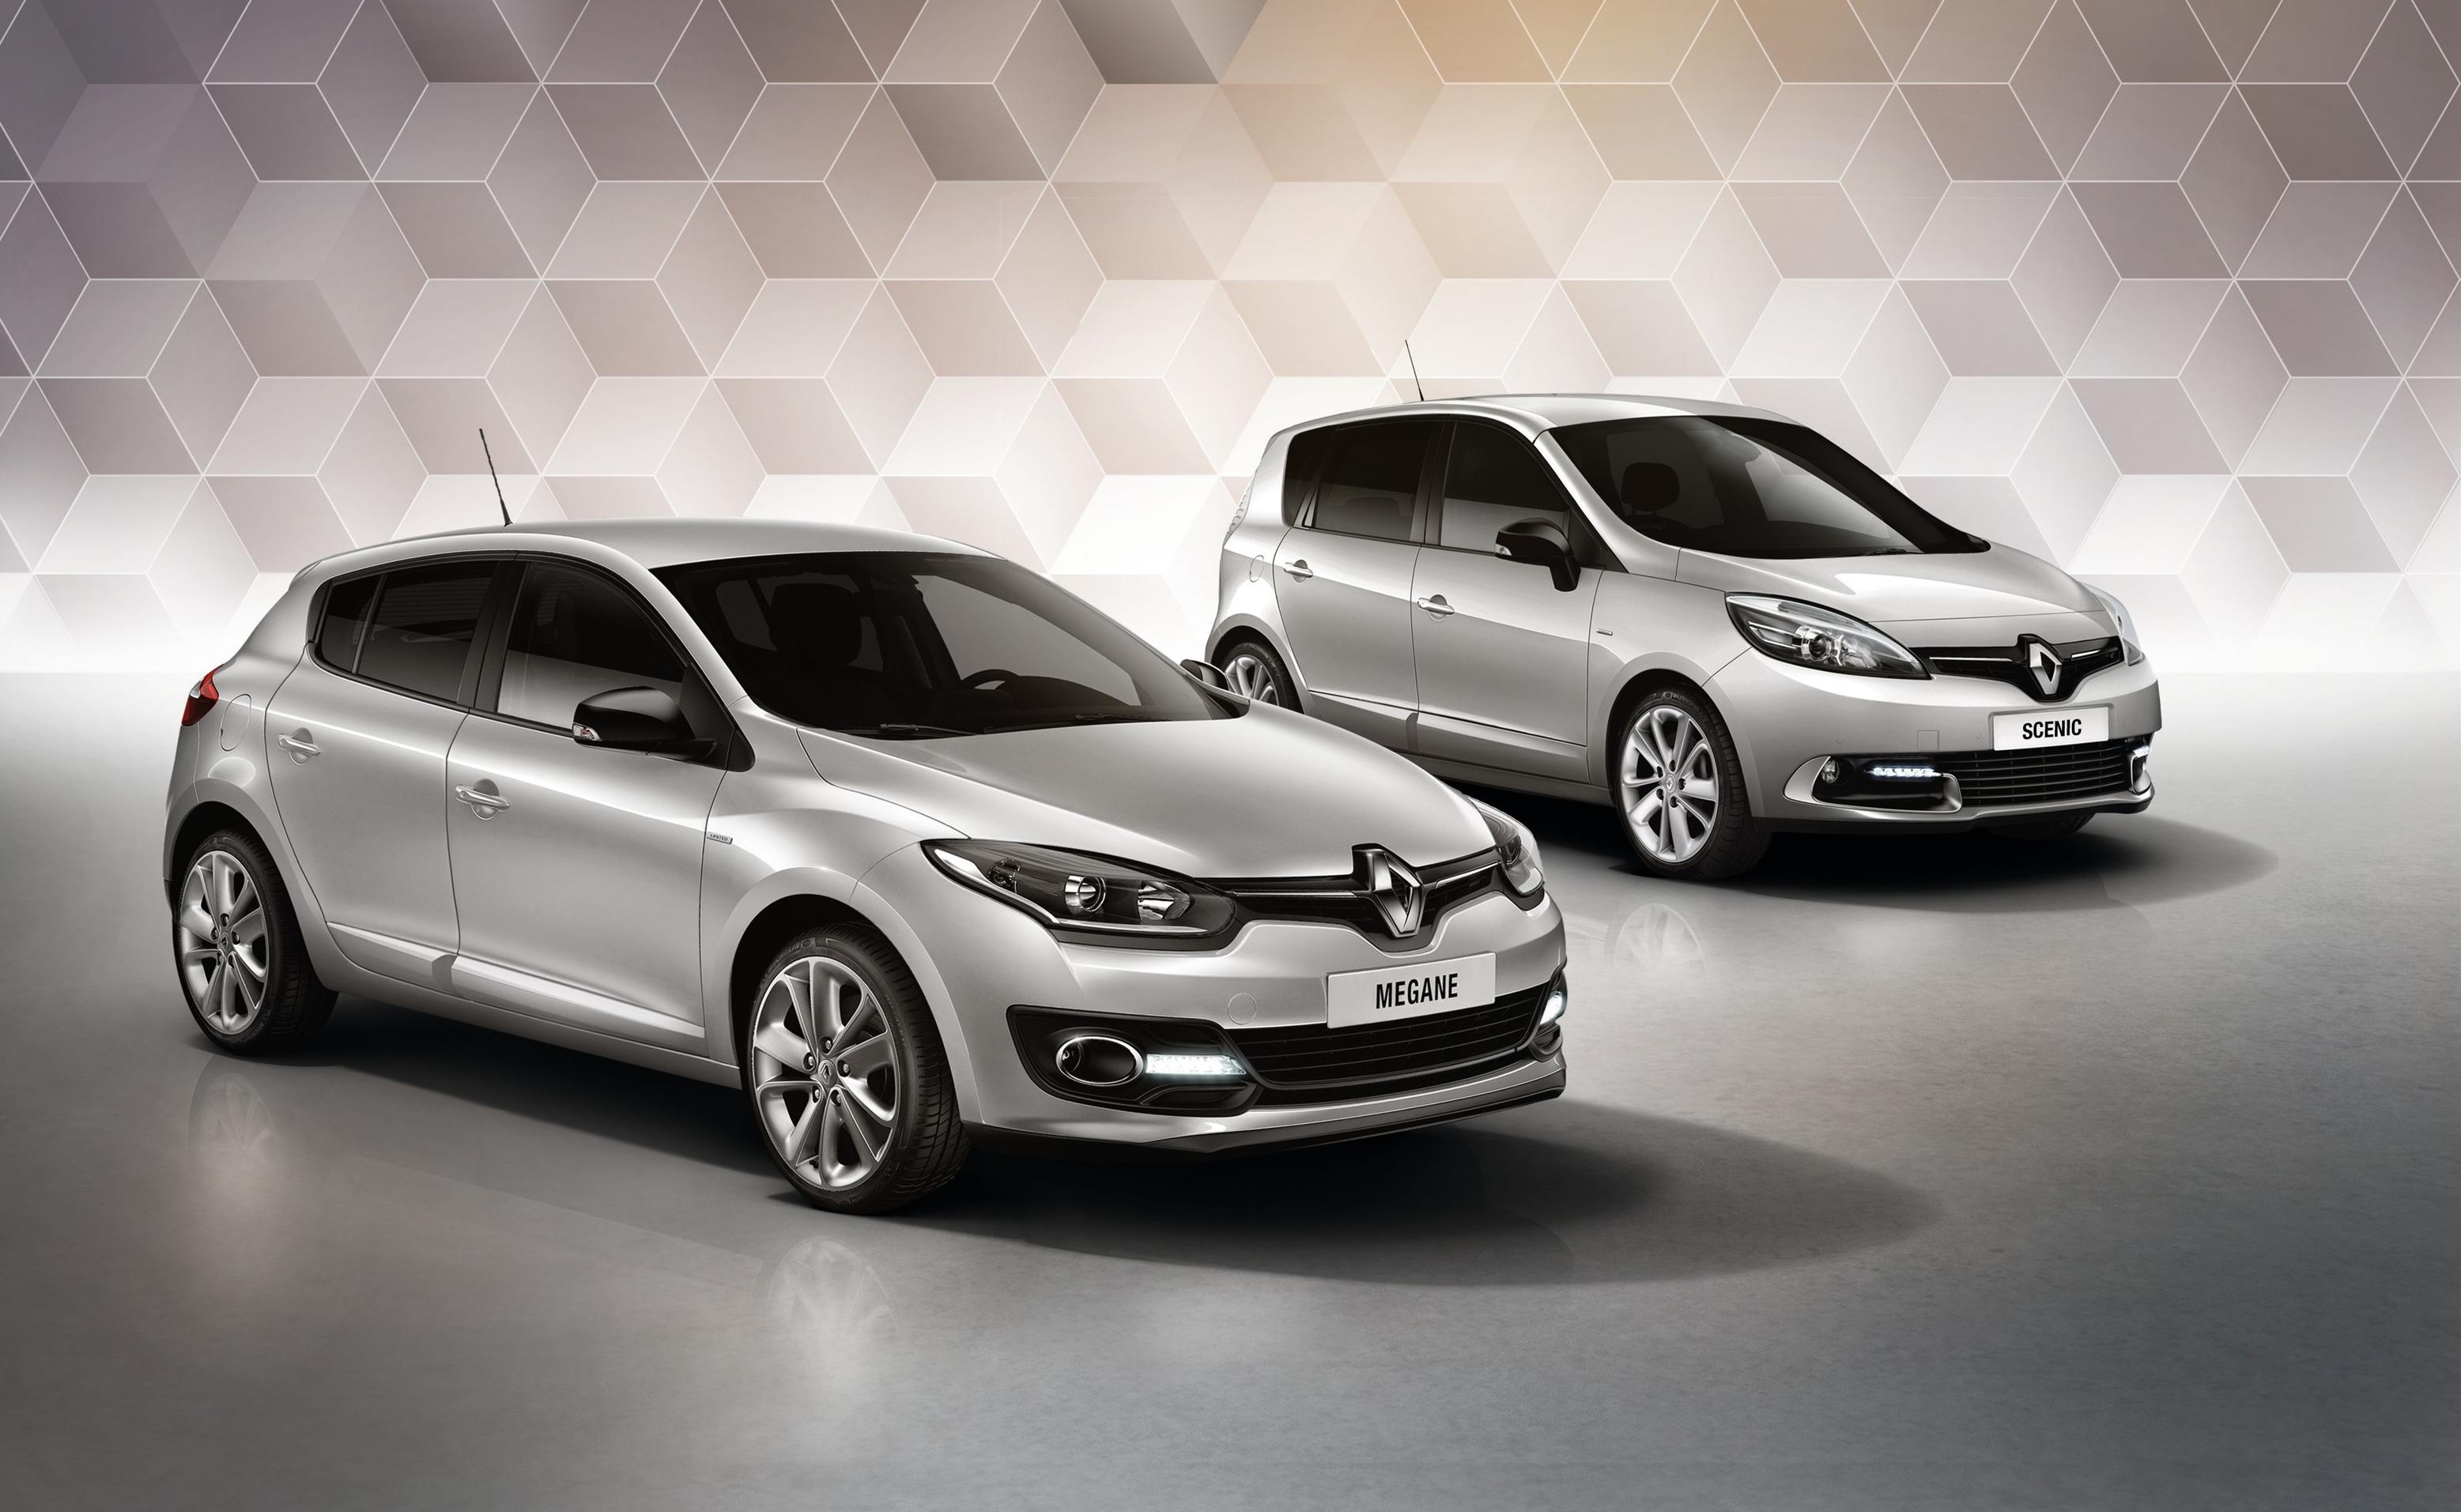 Nasce la gamma LIMITED Renault